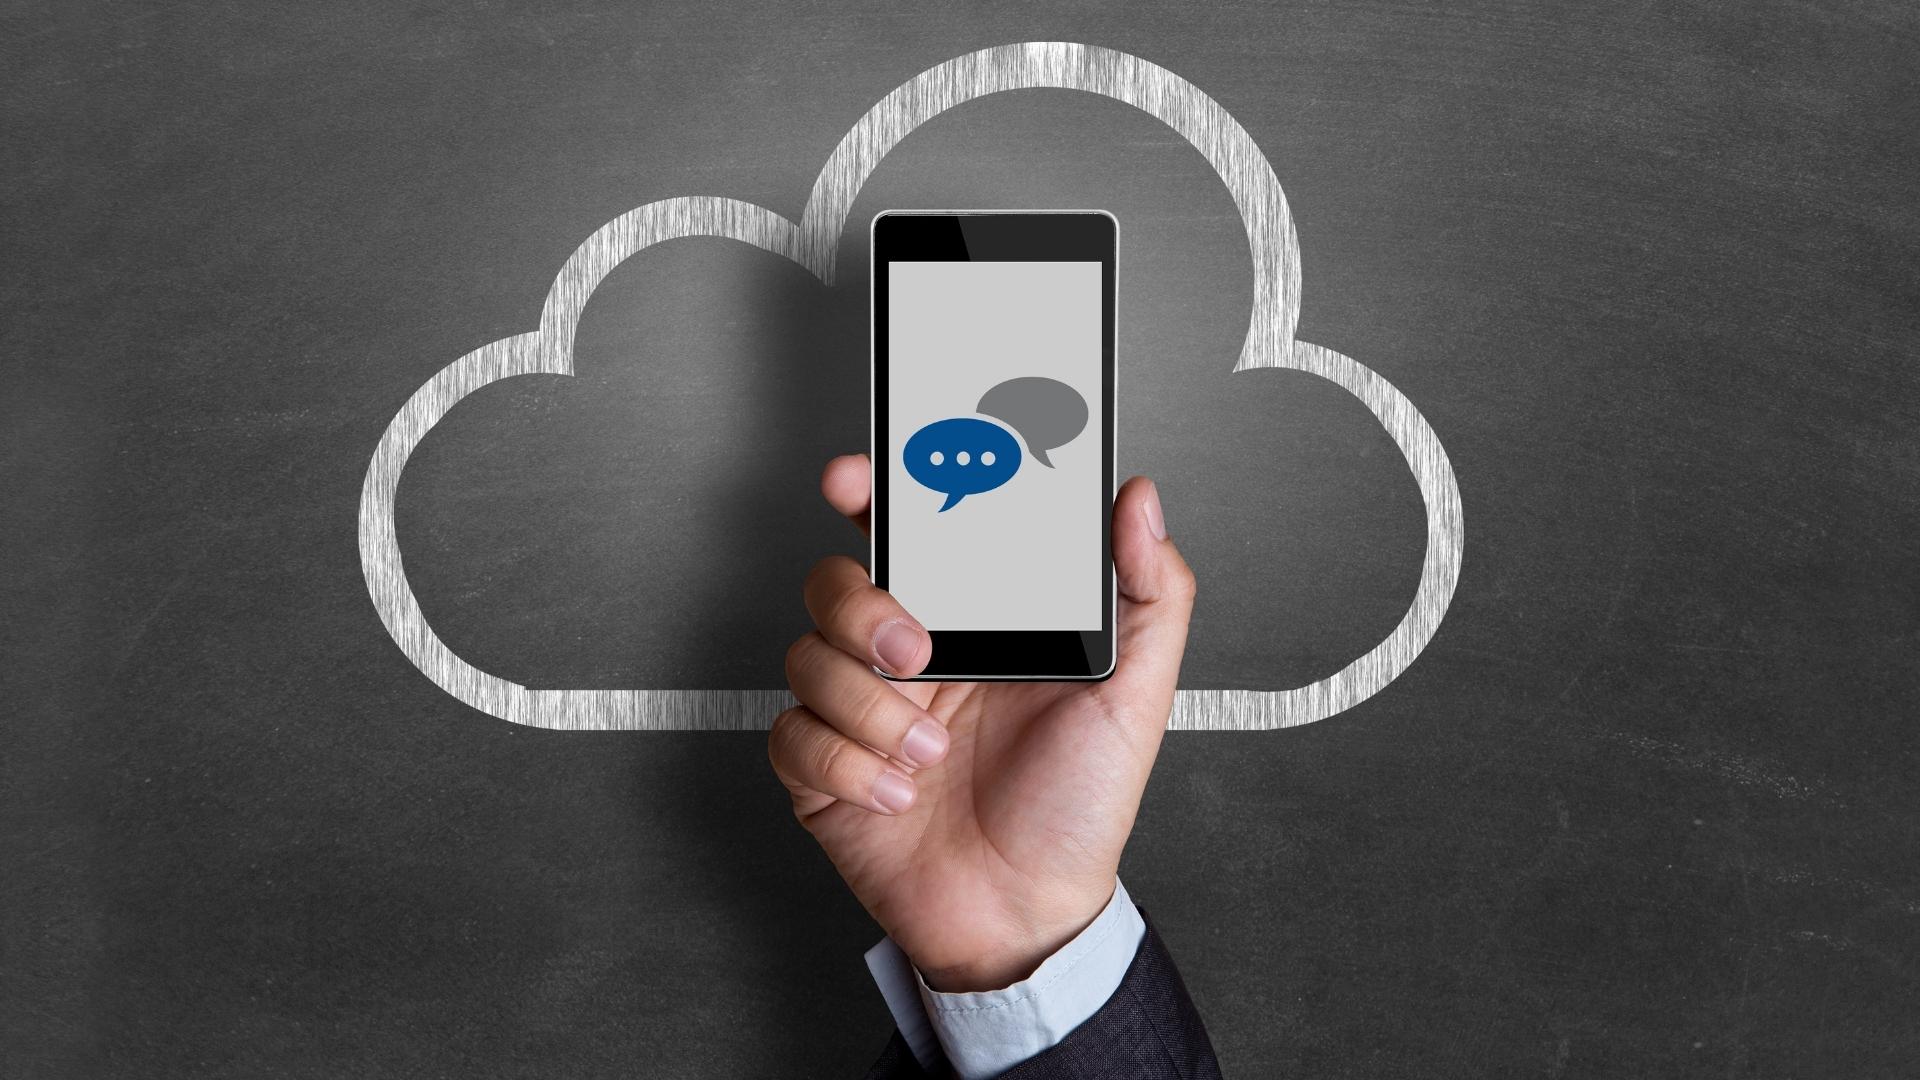 Title - Cloud Communications